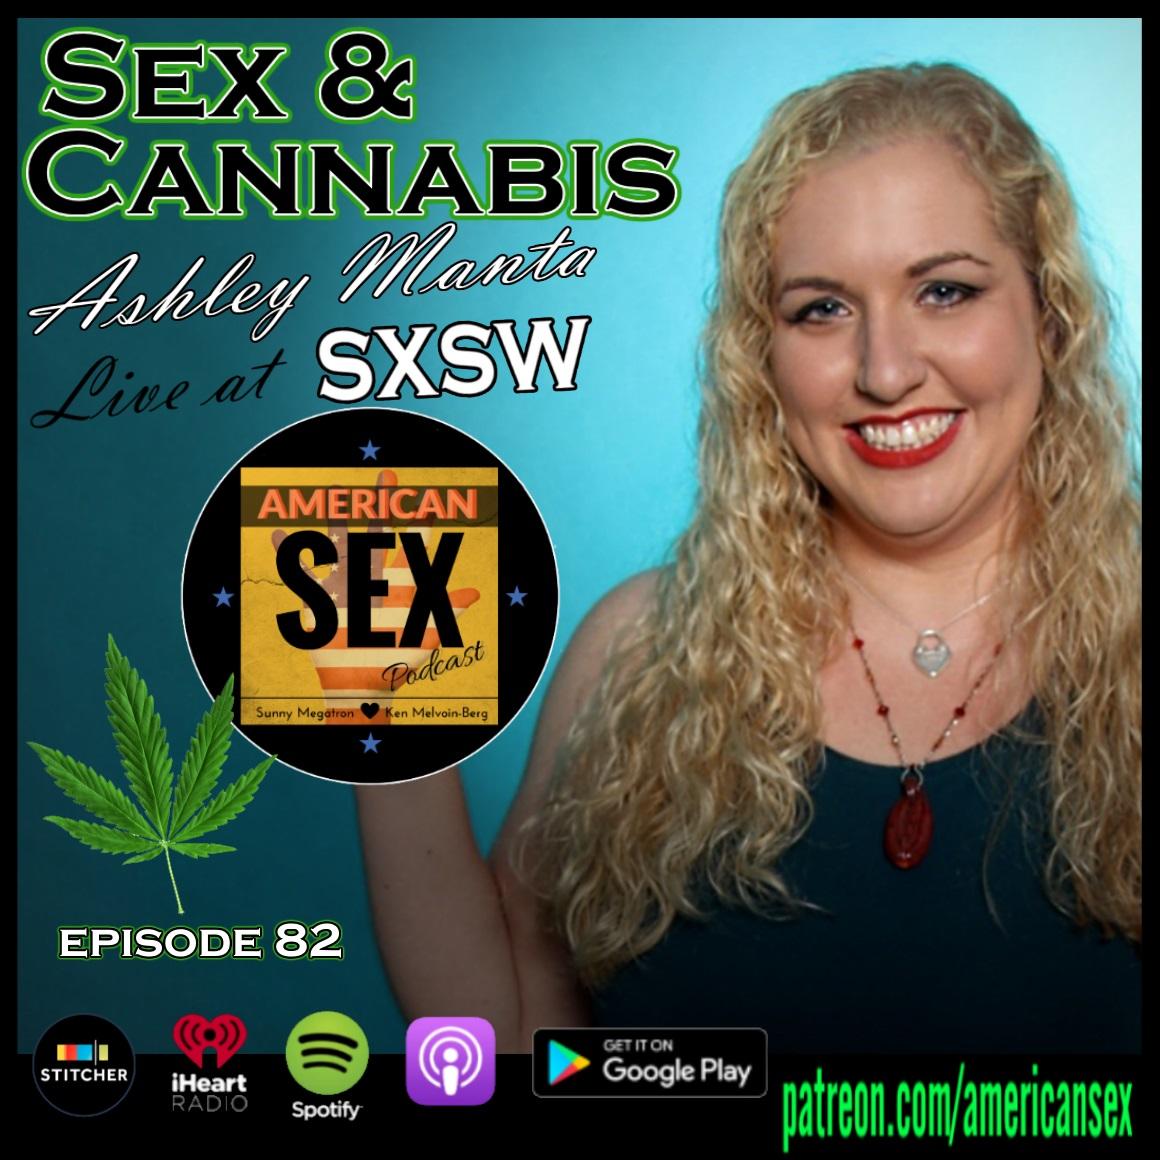 SXSW live podcast sex and pot Ashley Manta